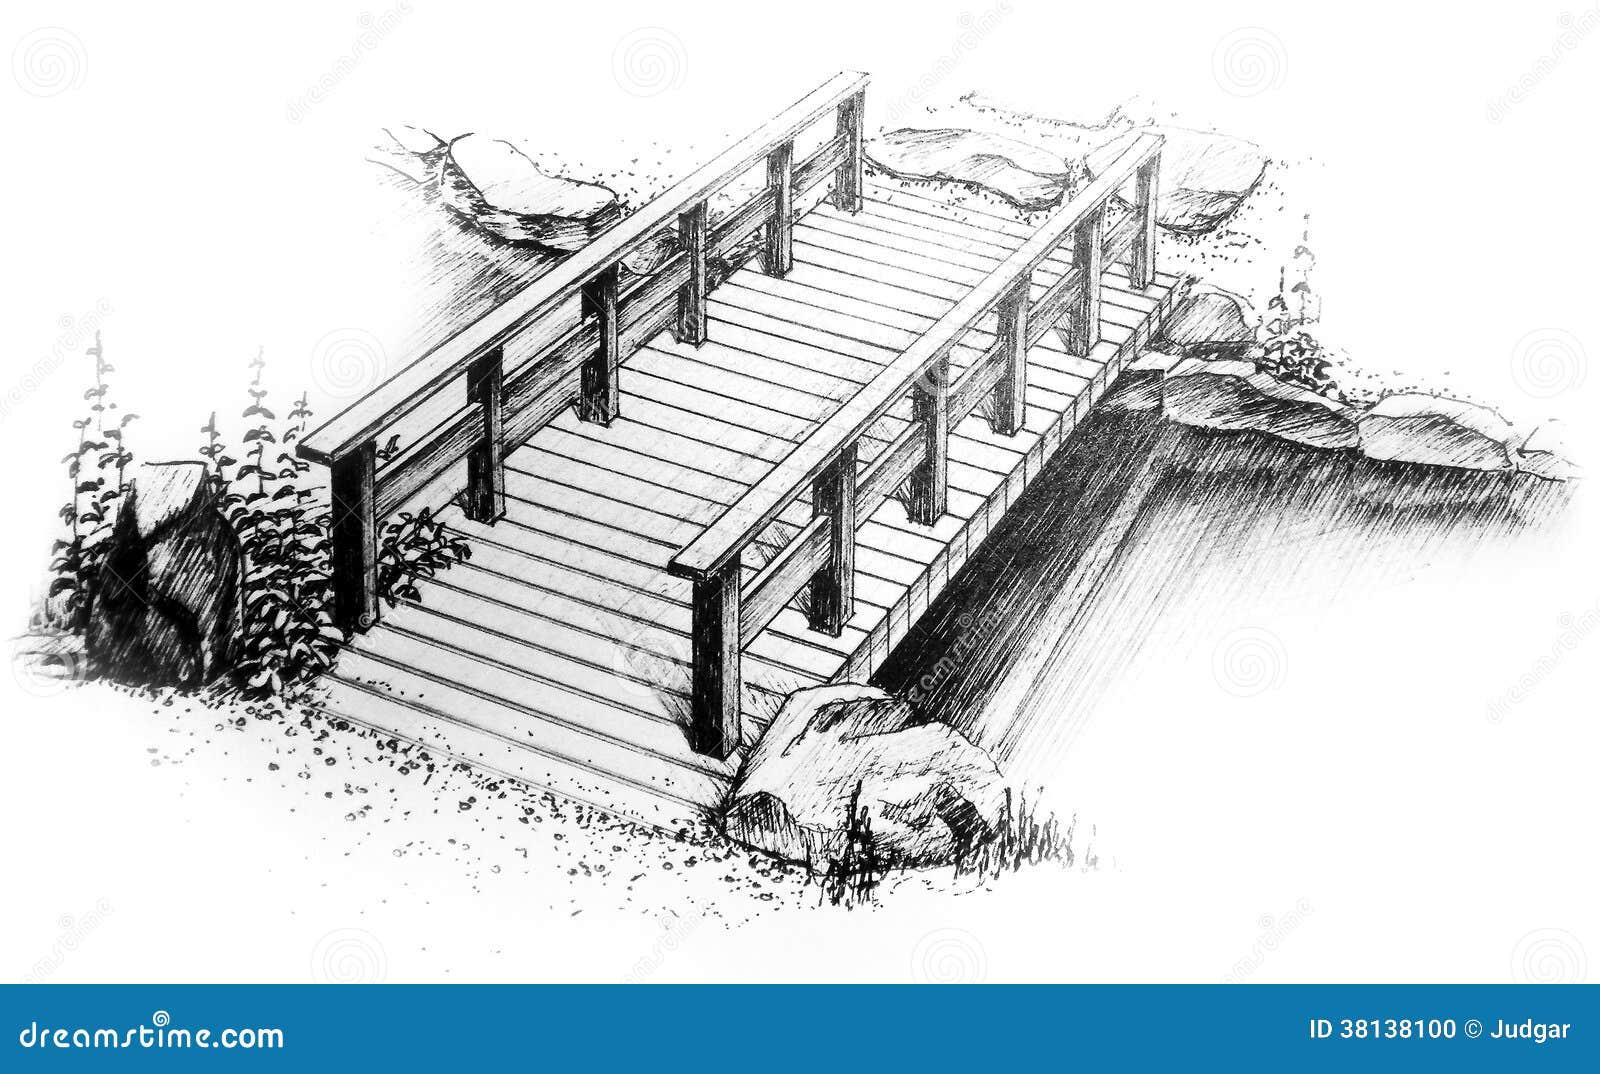 Dessin de dessin main lev e graphique de pont en bois for Disegni di ponte anteriore